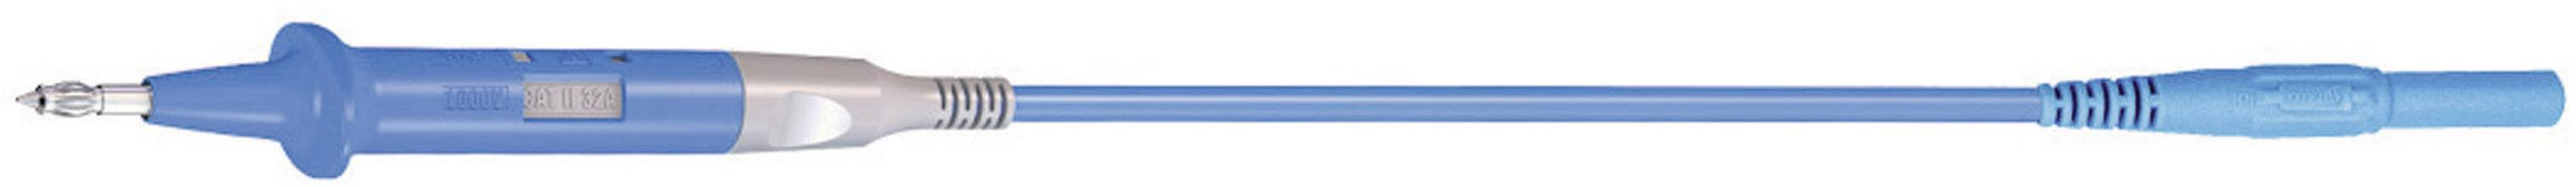 Merací kábel Multicontact XSPP-419, 2,5 mm², 1 m, modrý